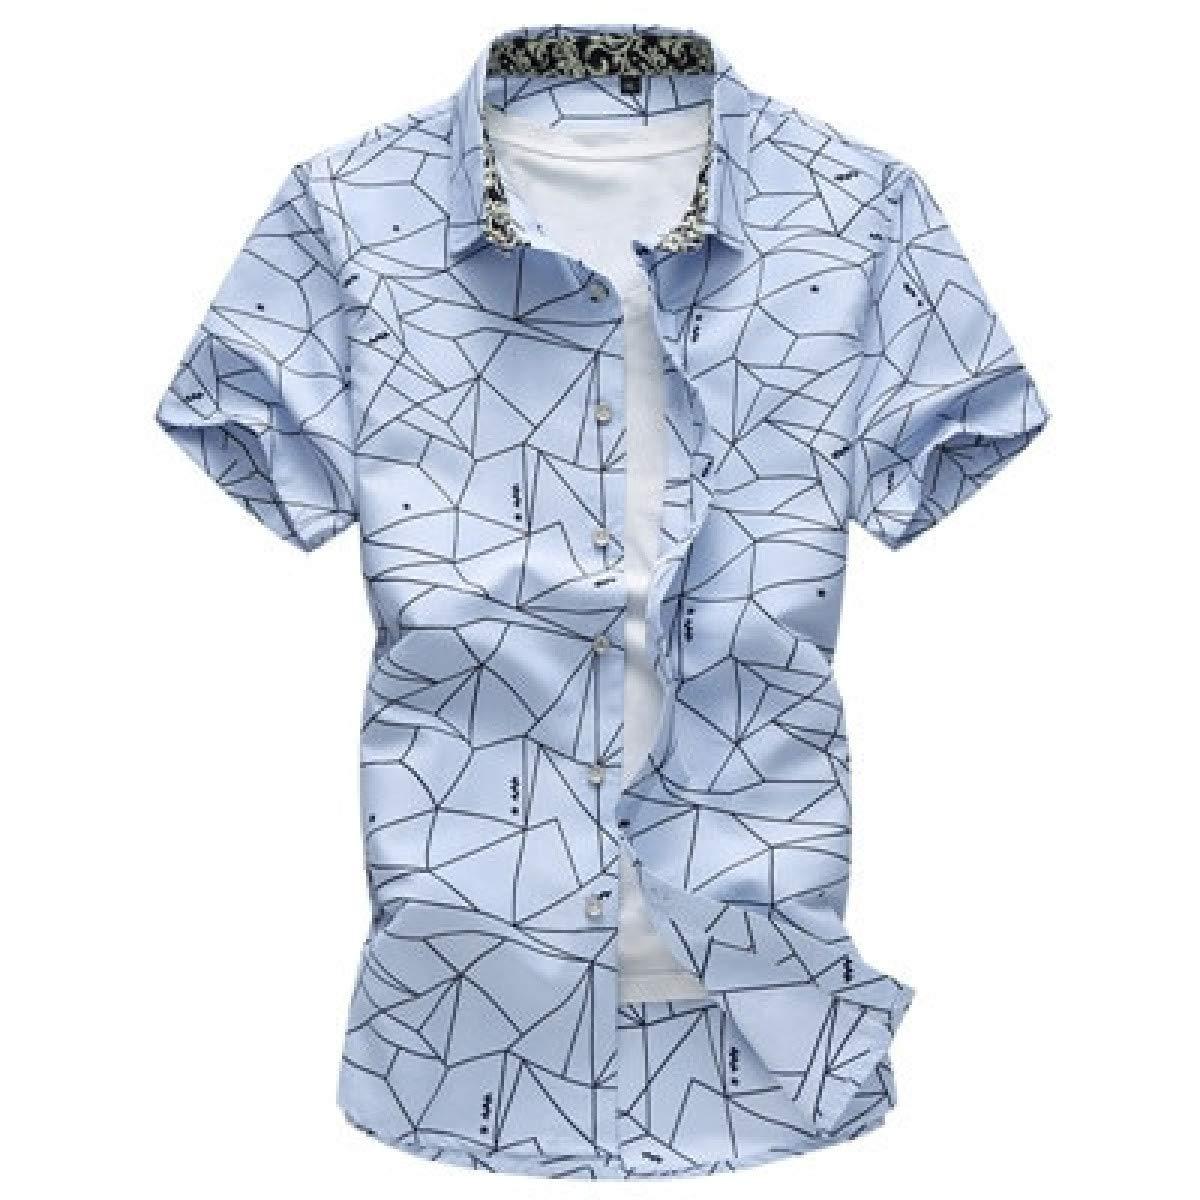 Men Shirts Plaid Printing Male Casual Short Sleeve Shirt Mens Clothing